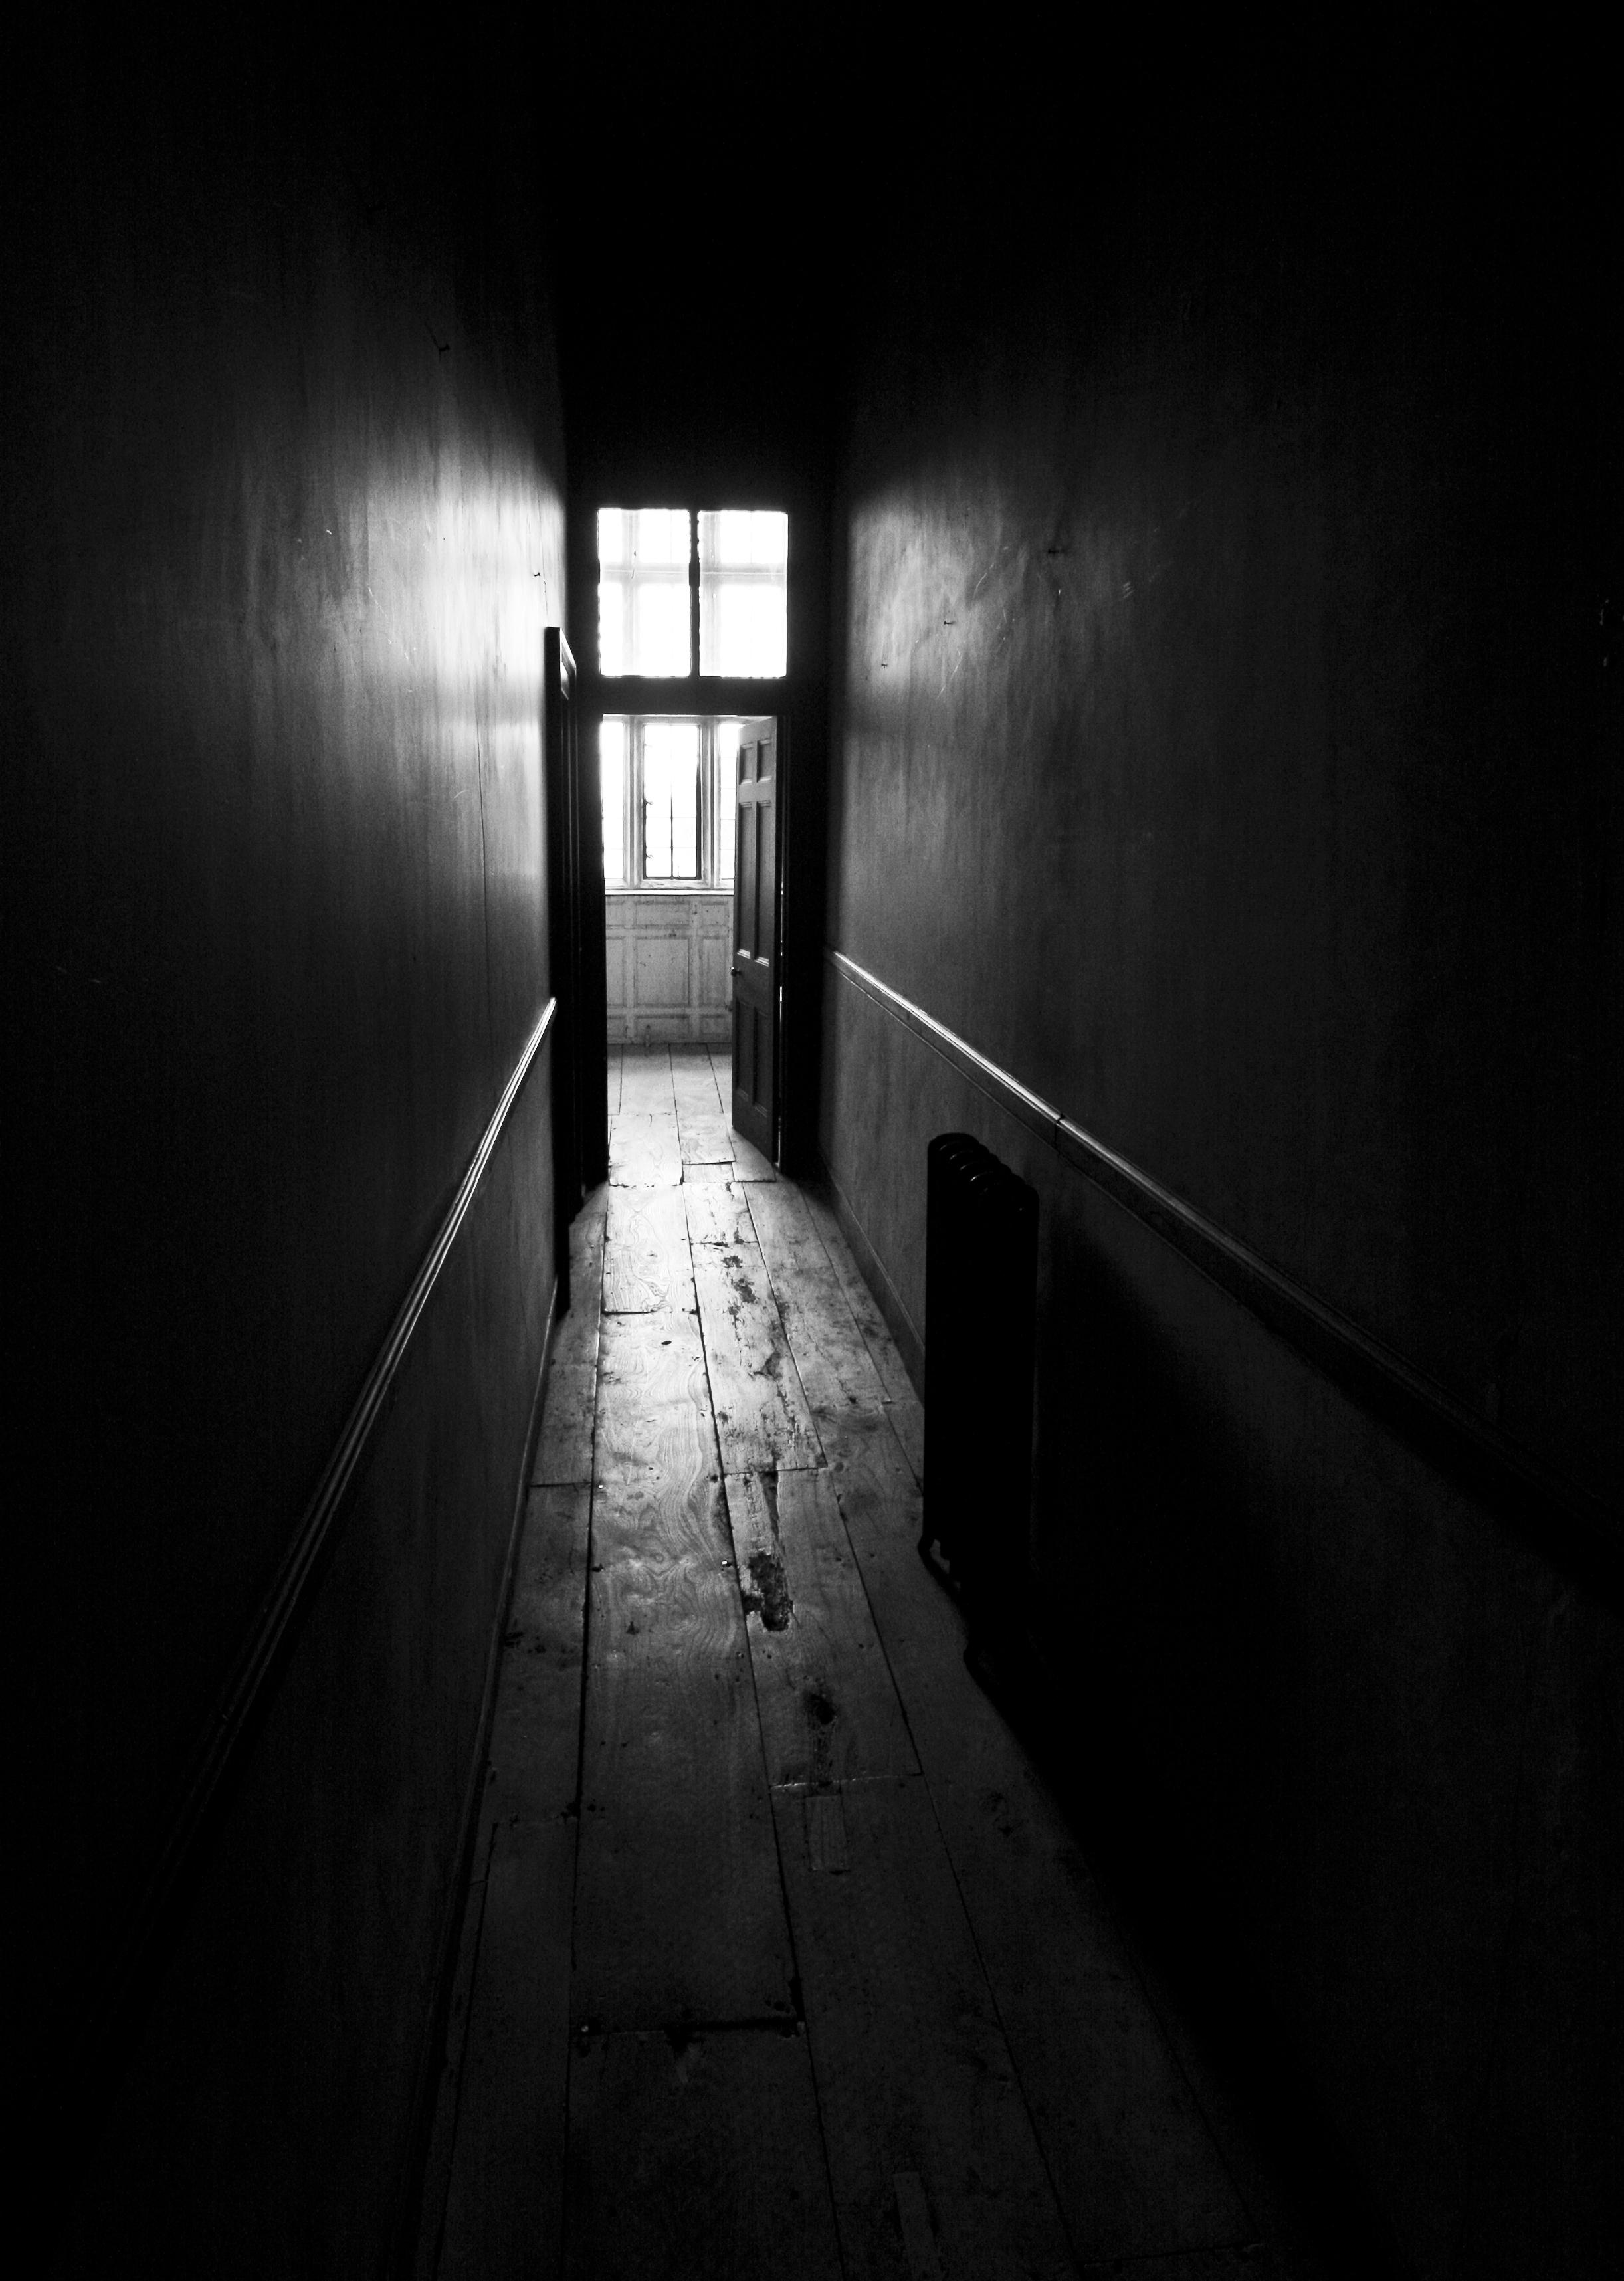 Description Dark corridor (4676385338).jpg Dark